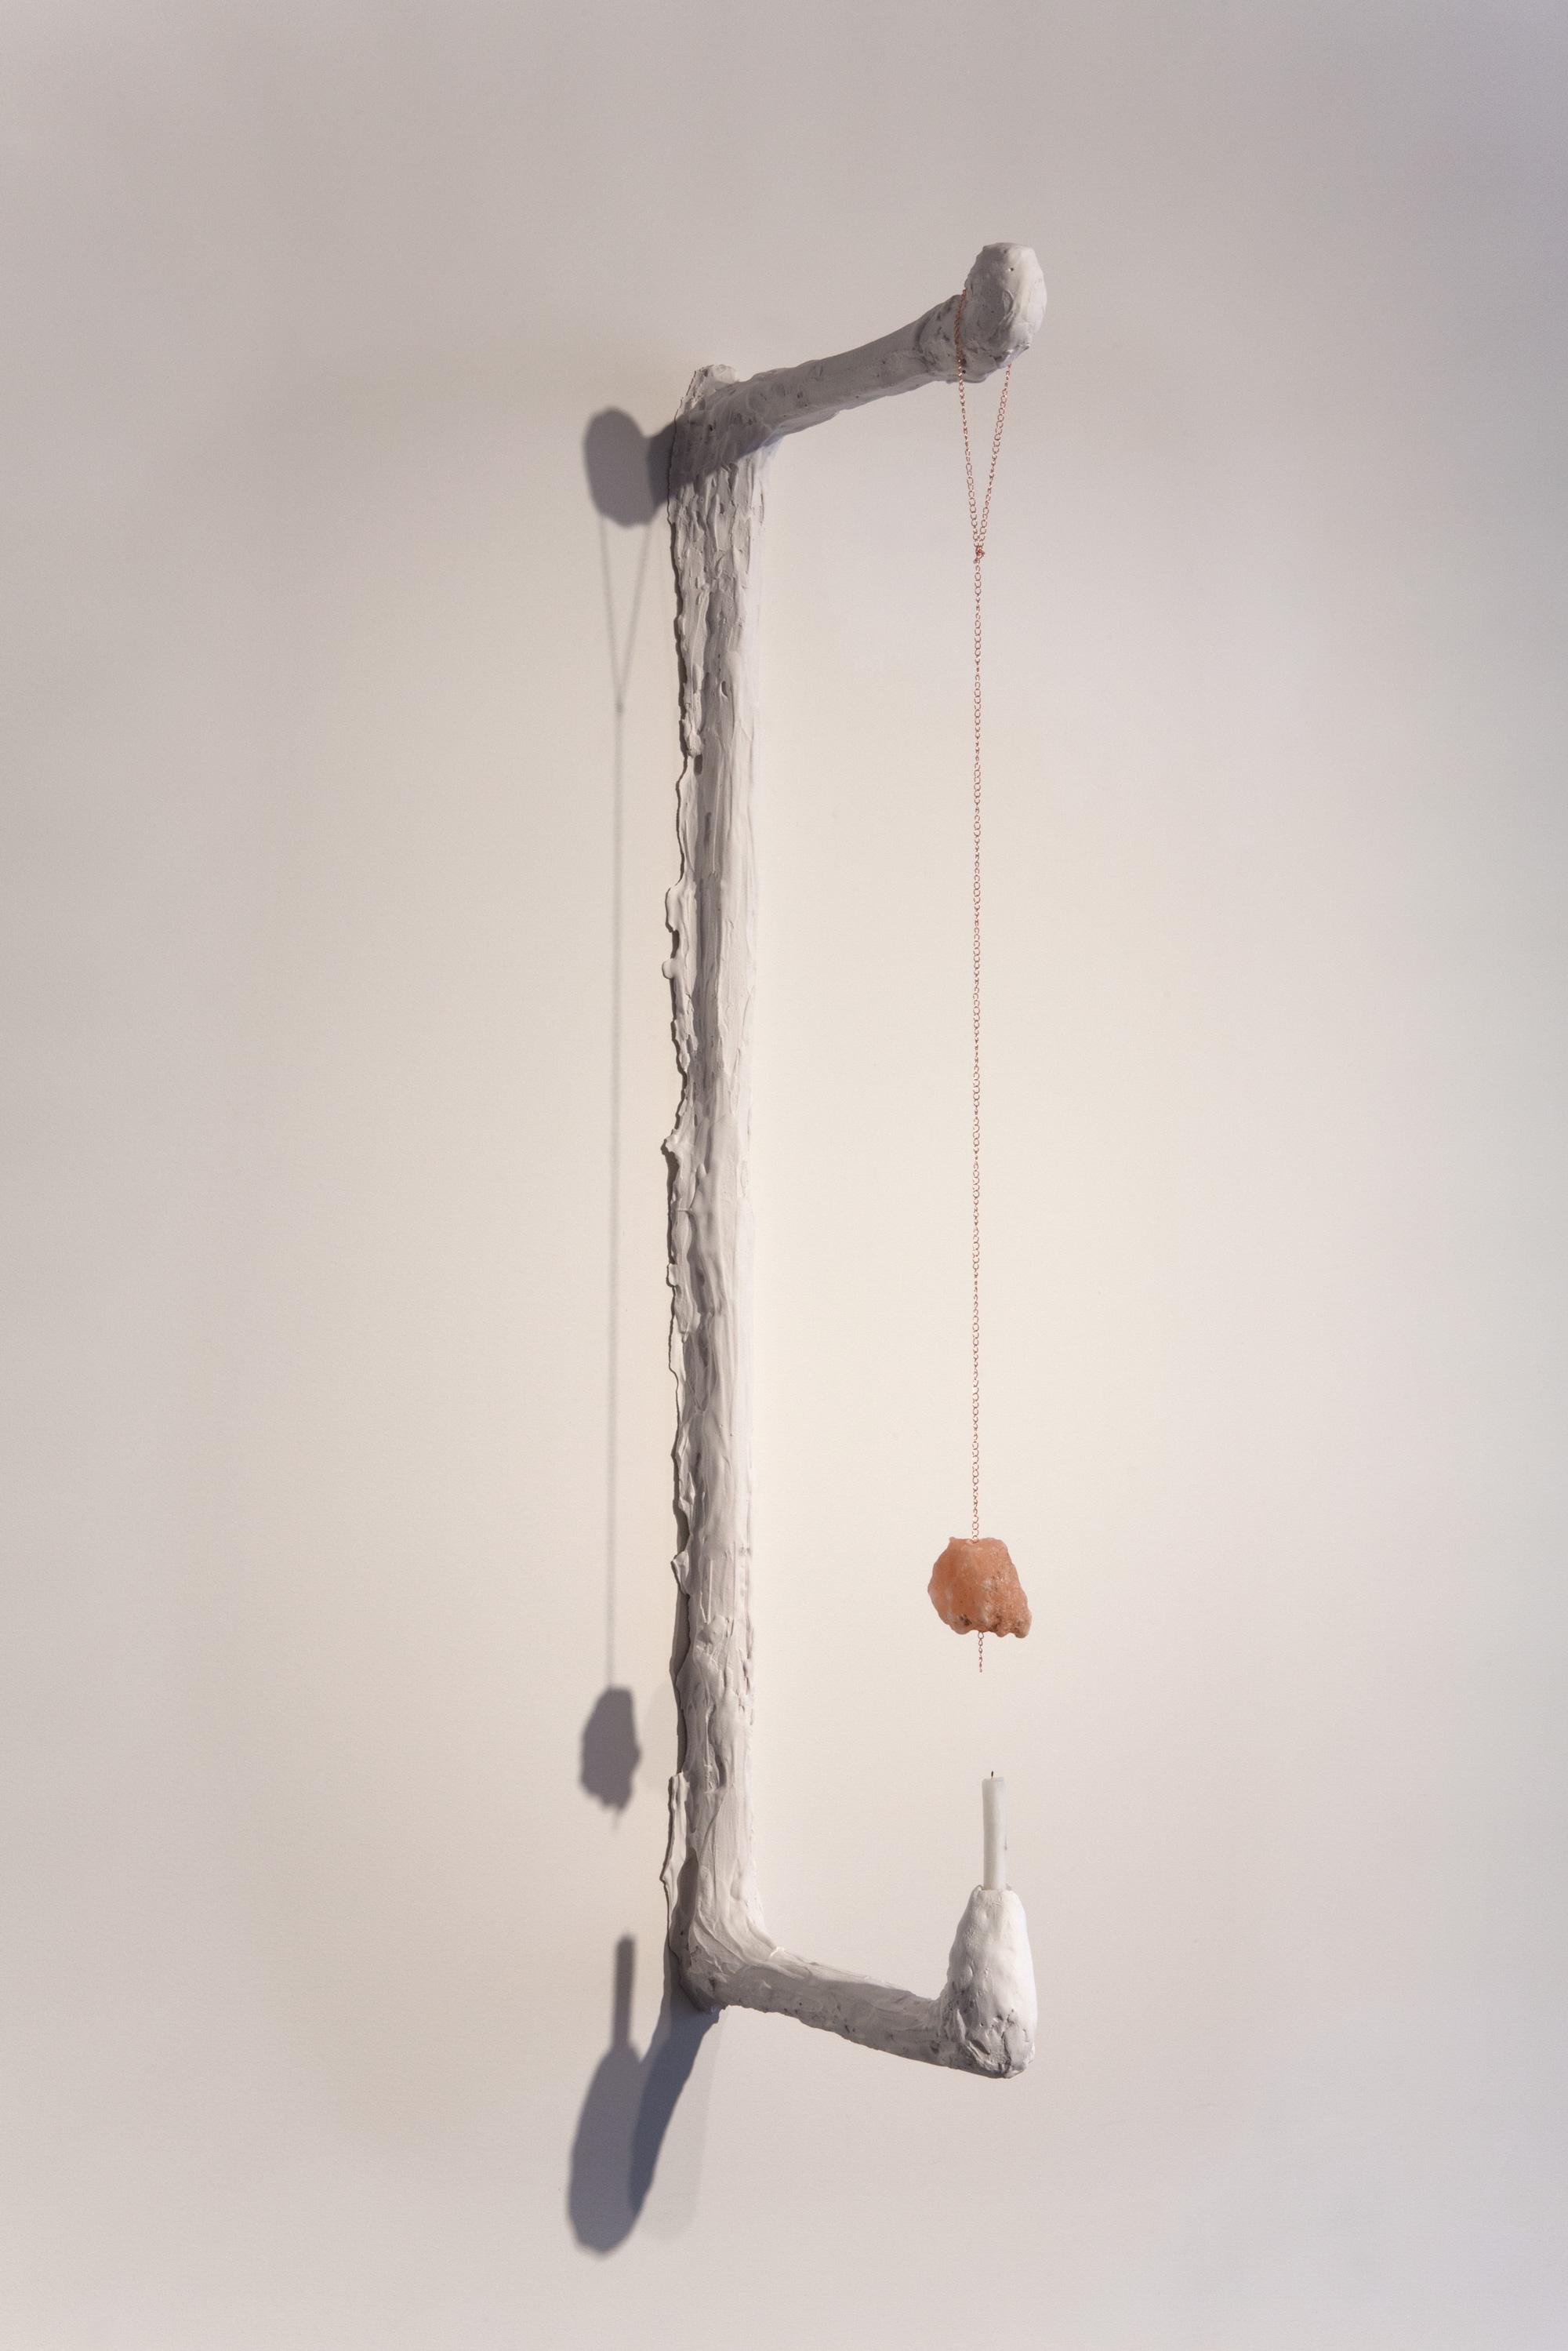 Kathryn O'Halloran, Rock Salt Scone, 2015, plaster, chain, Himalayan rock salt